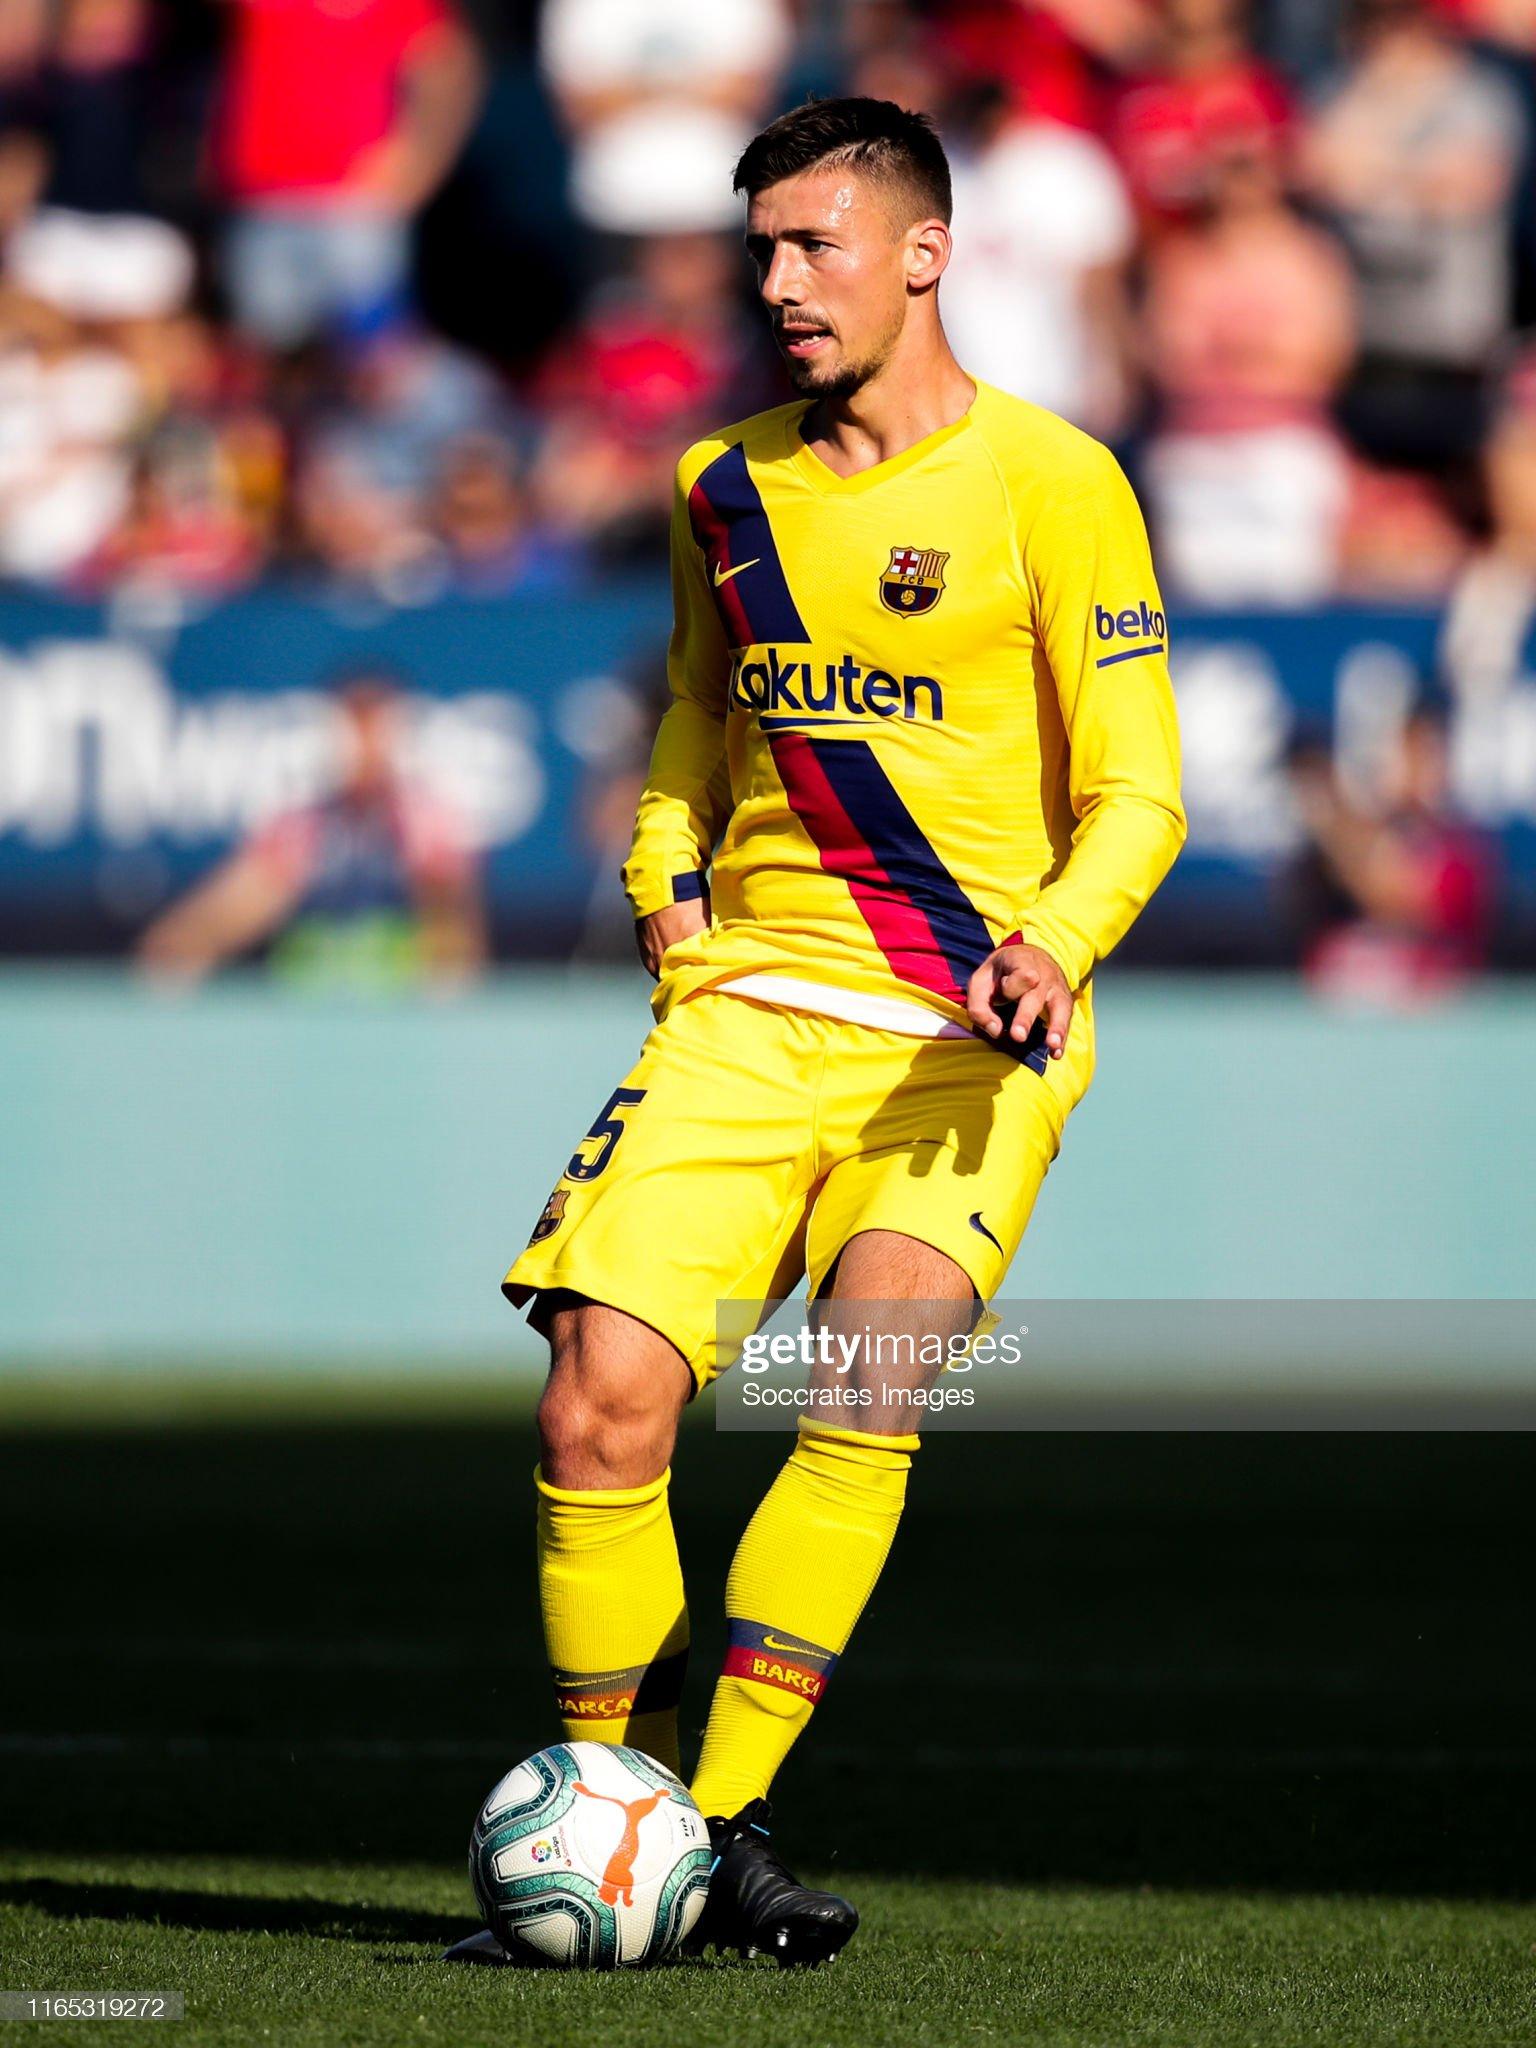 صور مباراة : أوساسونا - برشلونة 2-2 ( 31-08-2019 )  Clement-lenglet-of-fc-barcelona-during-the-la-liga-santander-match-picture-id1165319272?s=2048x2048